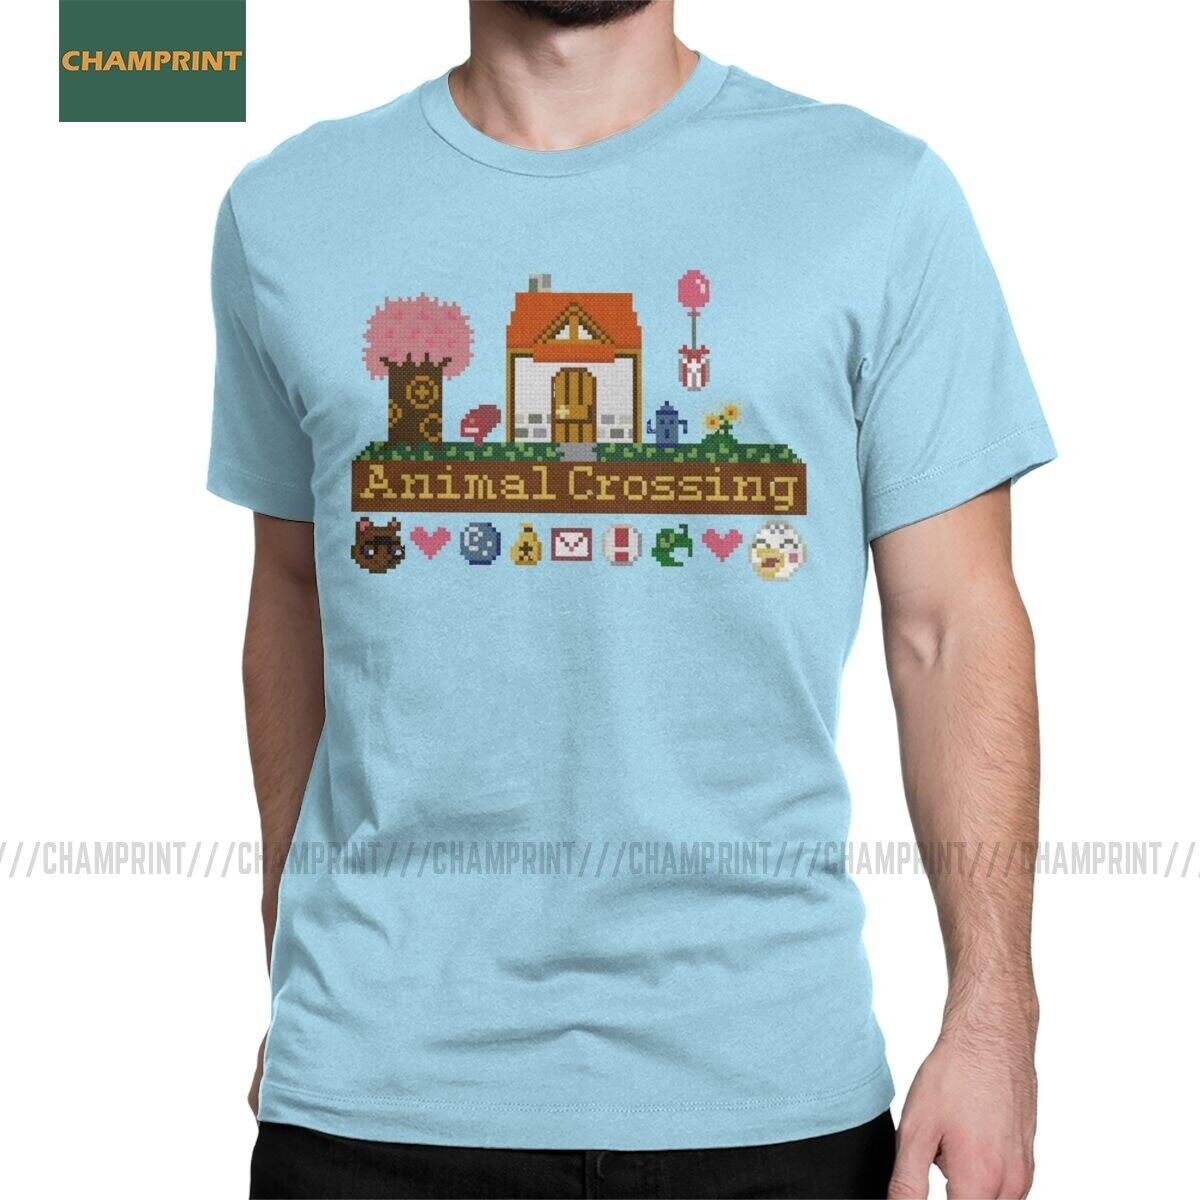 Animal Crossing 8-bit House Shirt, Sky Blue / XL